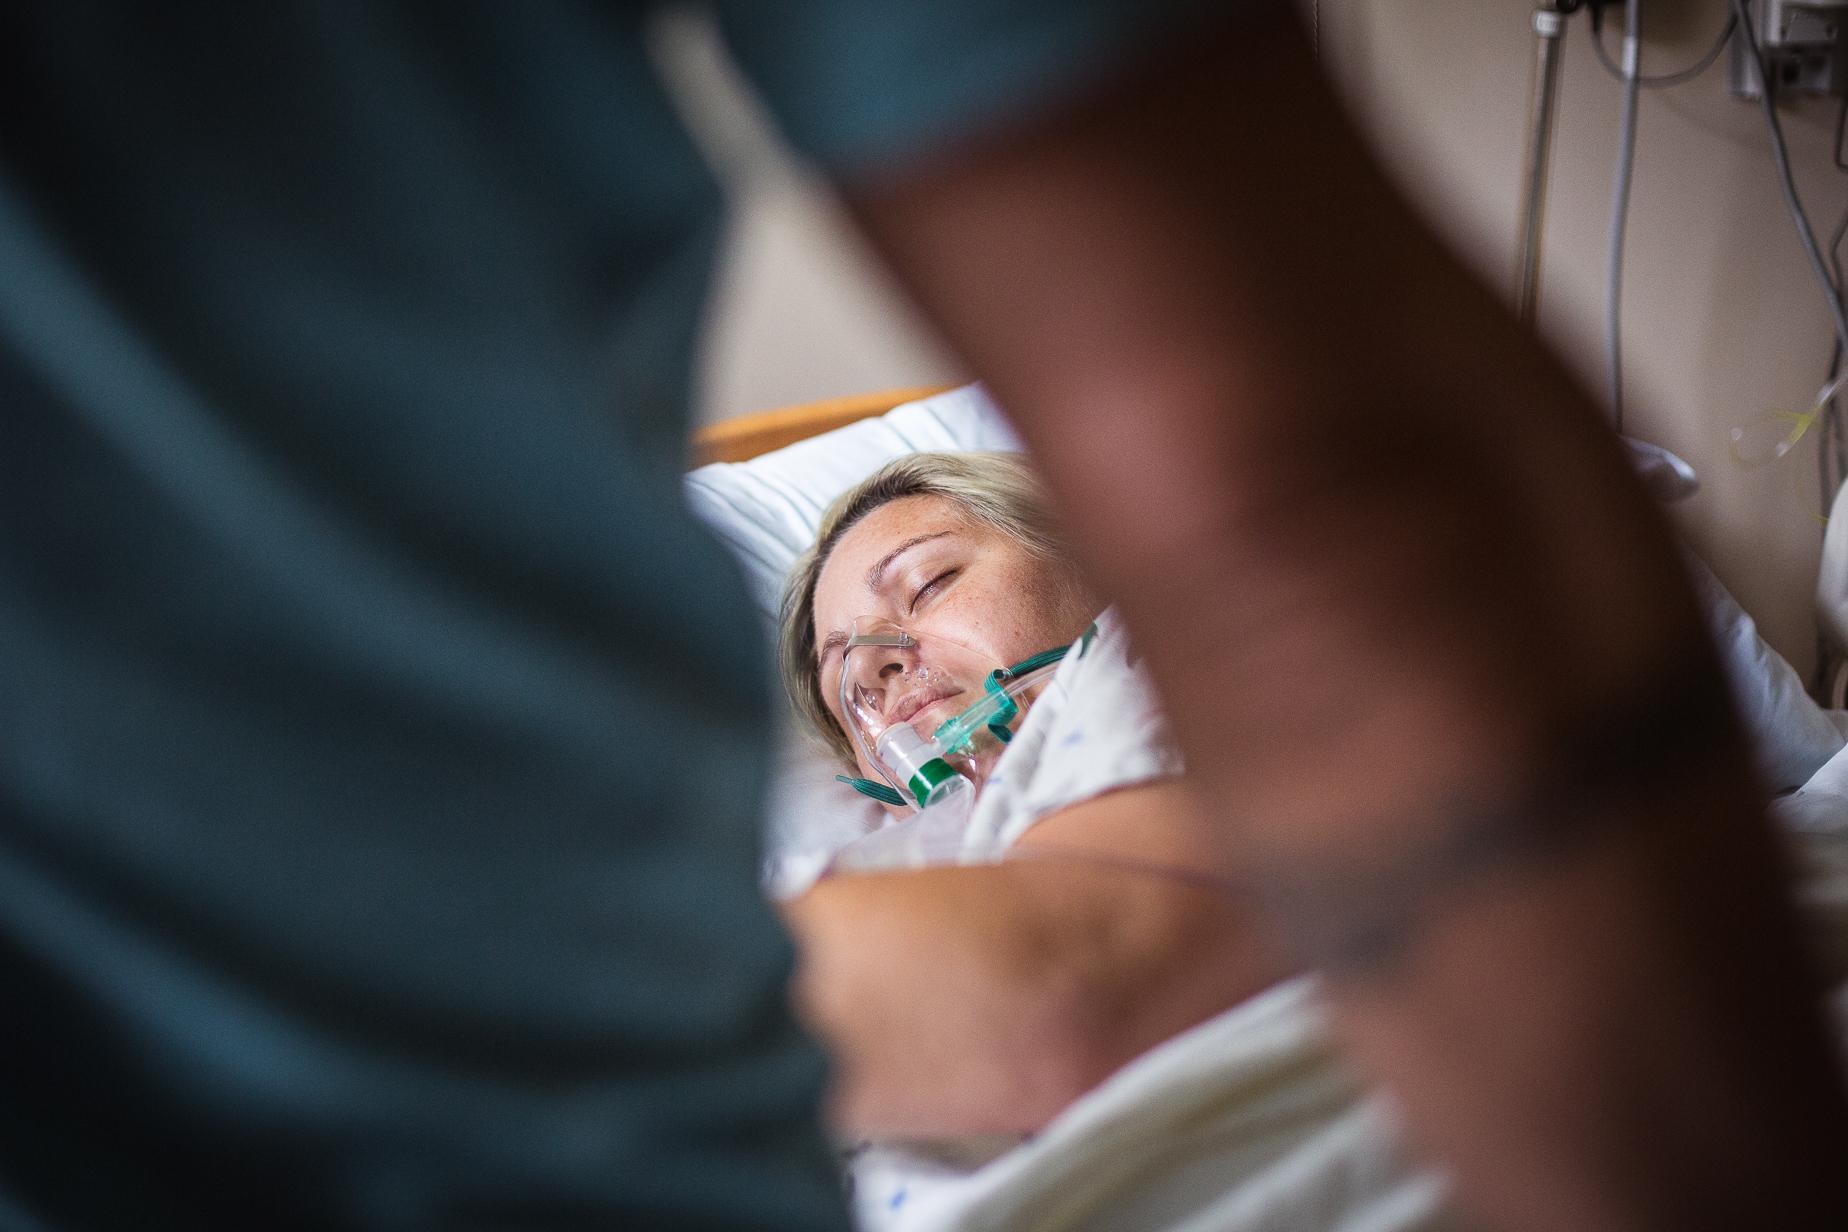 west-boca-hospital-gentle-c-section-epidural-vbac-home-birth-mary-harris-palms-birth-house-center-5.jpg